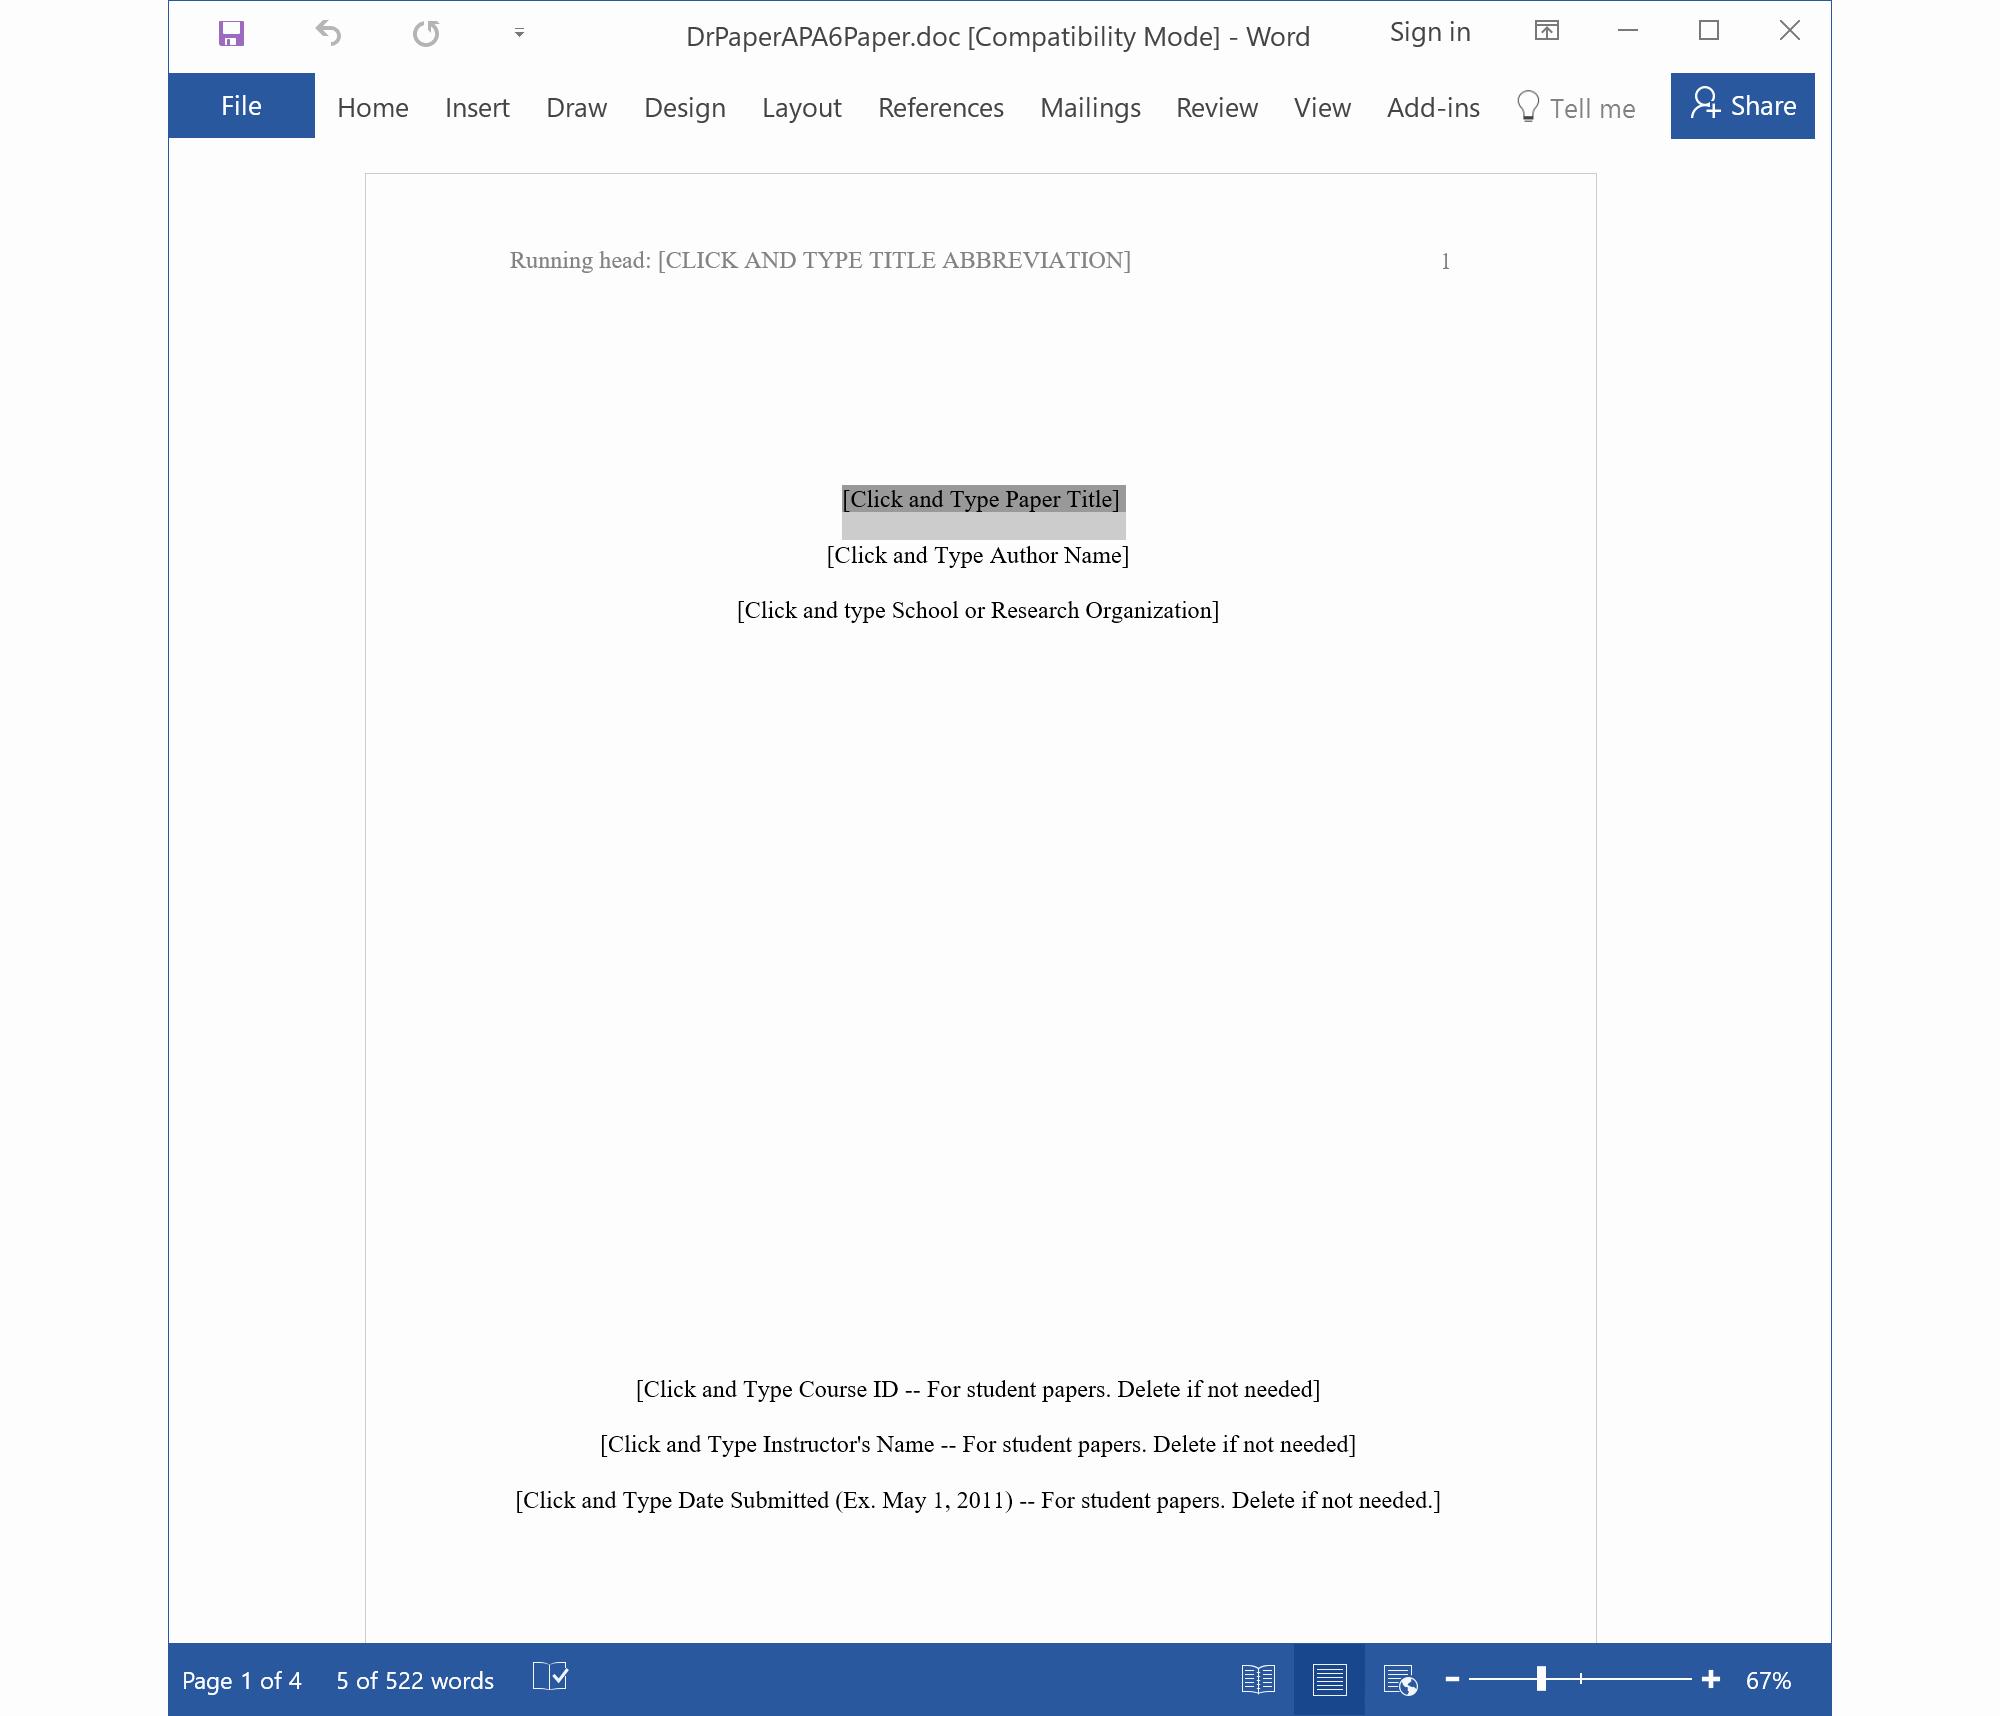 Apa format software Free Download Inspirational Dr Paper software Apa format Made Easy Mac [download